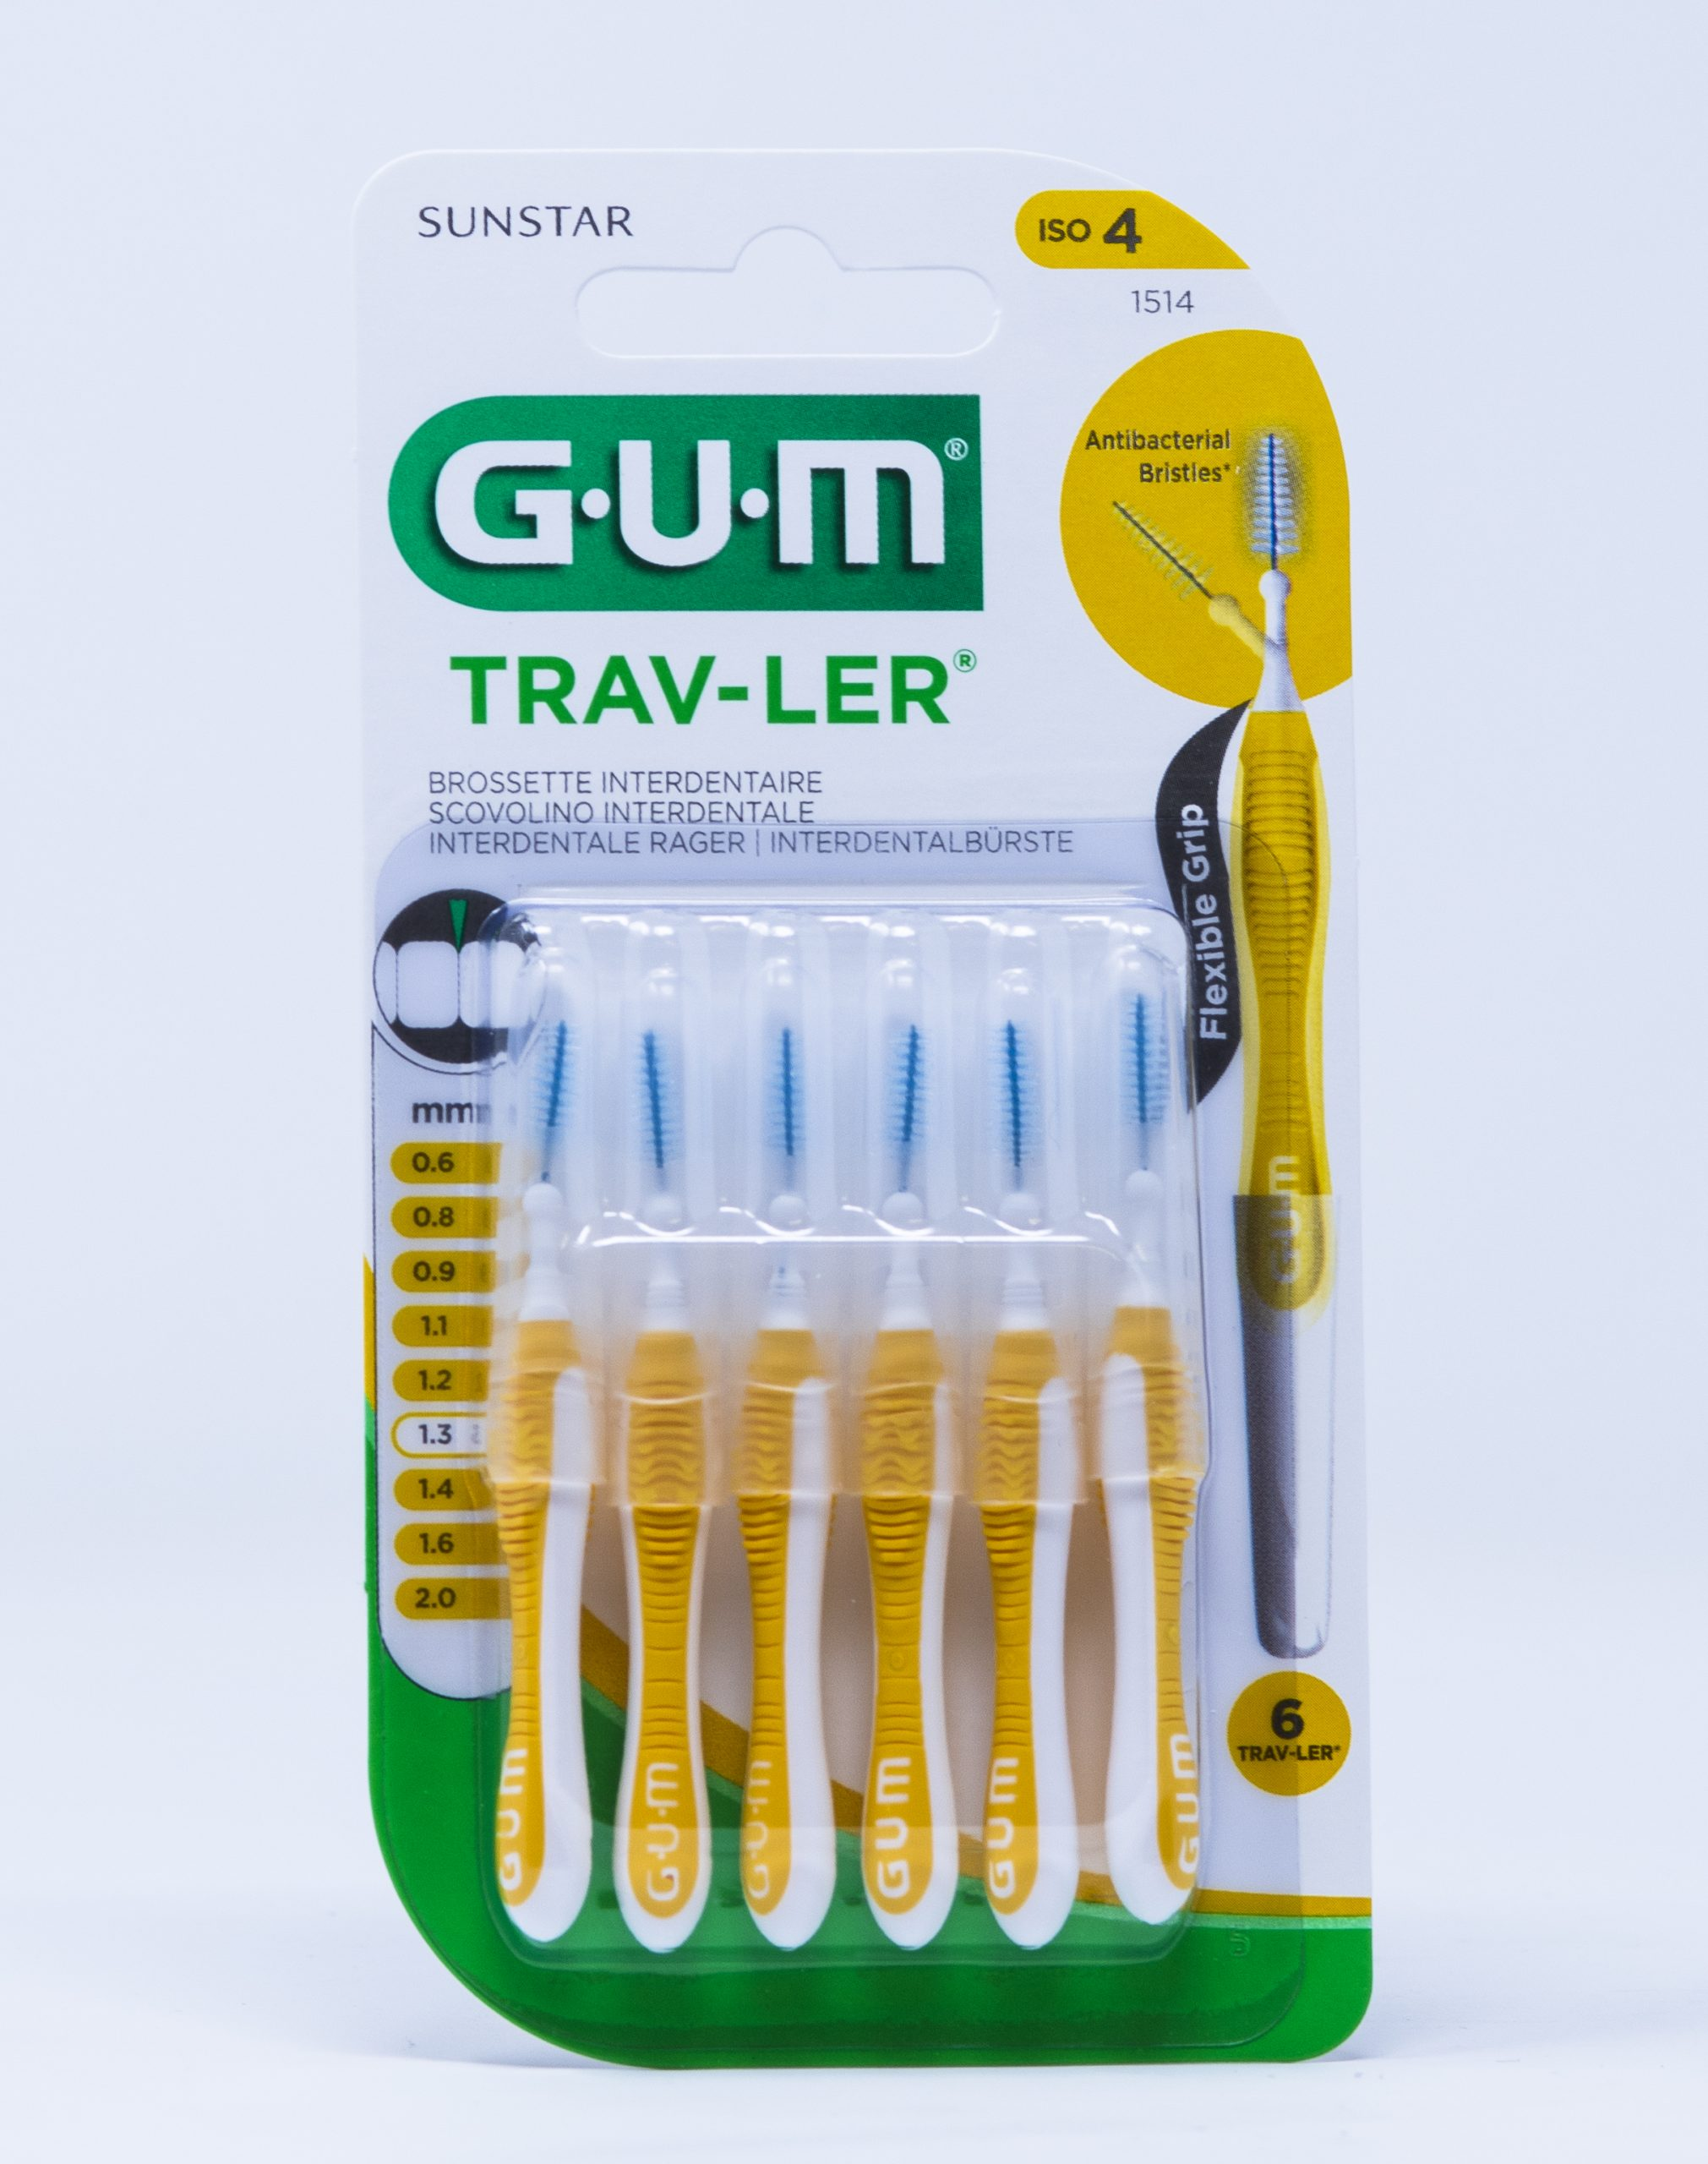 Gum Scovolino Trav-Ler ISO 4 – 1,3 mm | 1514